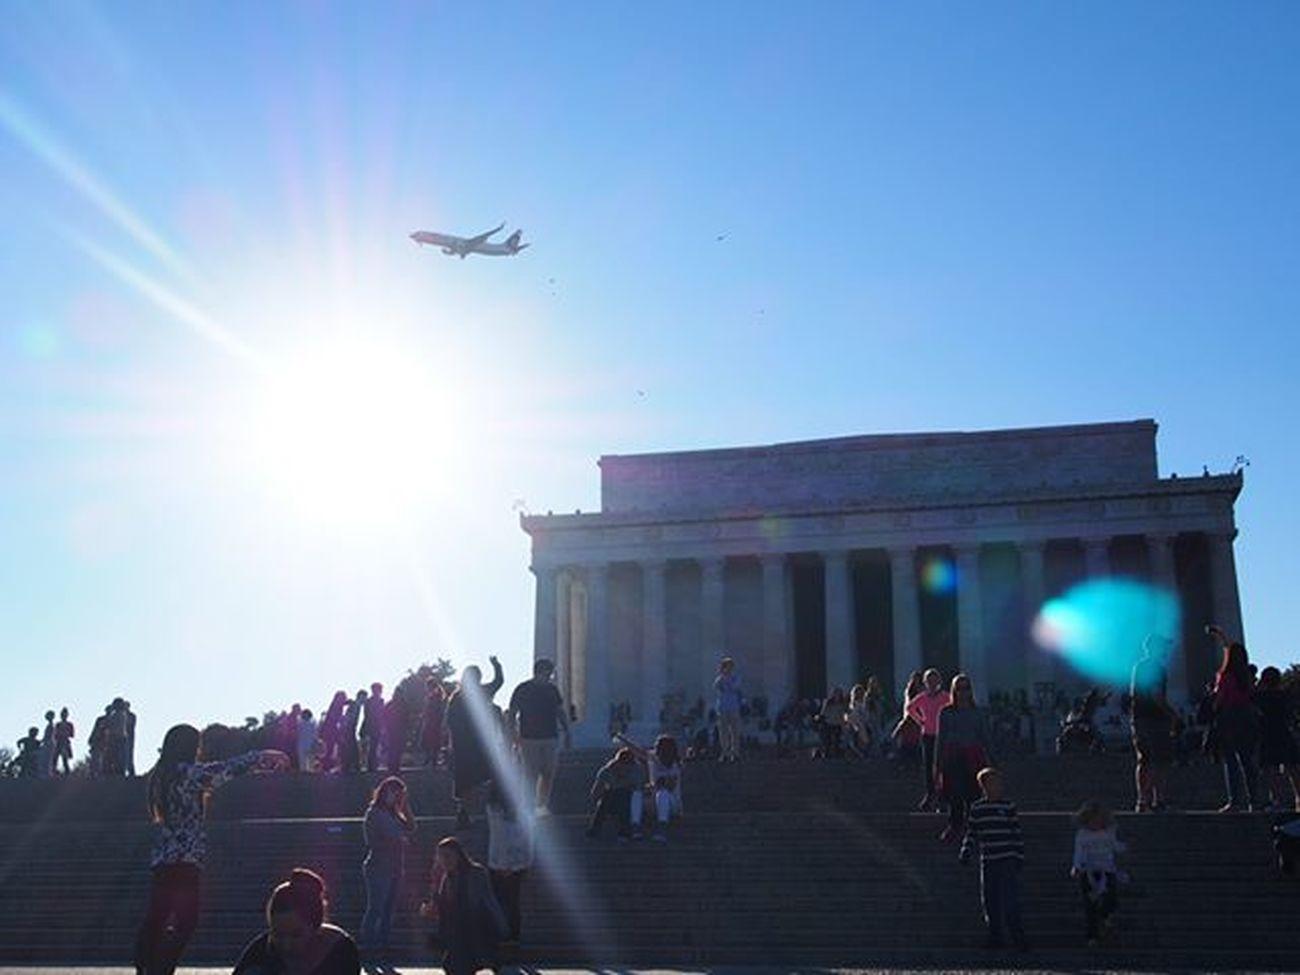 The Lincoln Memorial in Washington D.C. ---------------------------------------- WashingtonDC ExploreUSA Wanderlust Travel Instatravel Olympus Lincolnmemorial Lincoln Sunny Sunnyday Emancipation Sunshine Explorewashington History Plane Flyingthroughthesun Crowd Crowded